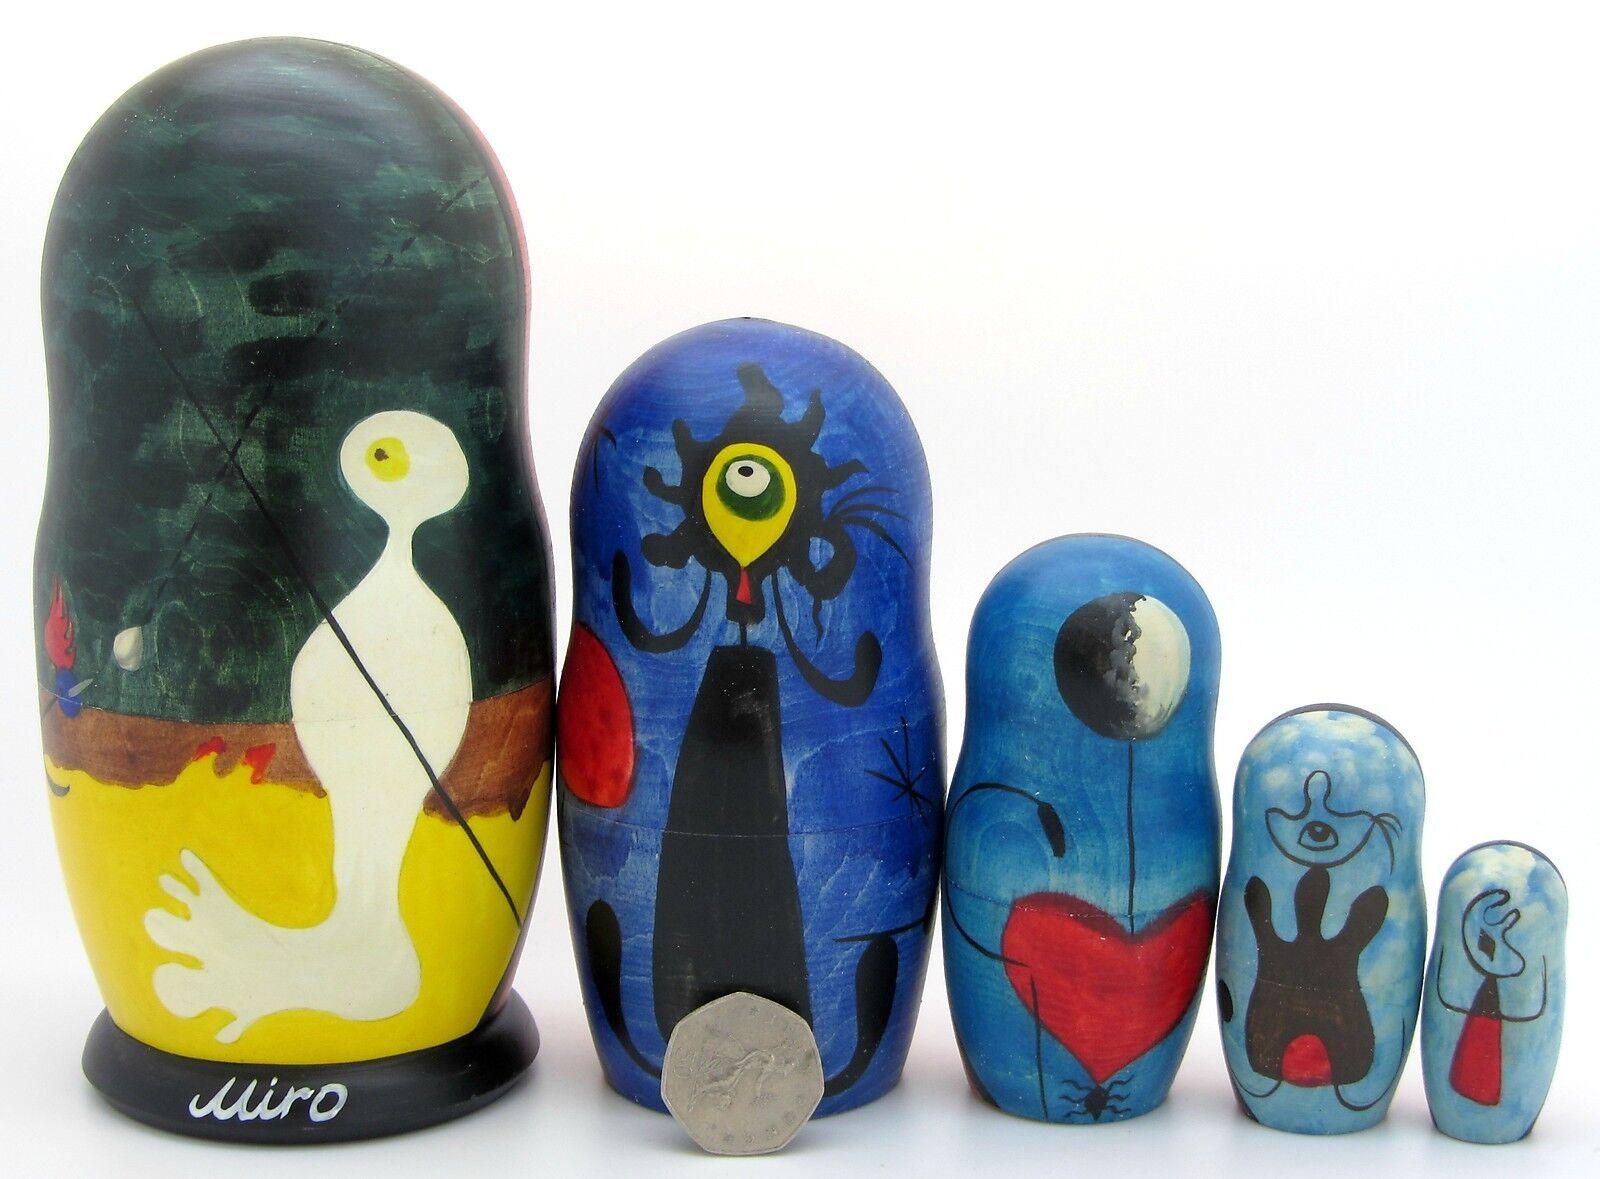 Muñecas-caja Rusas Matrioska Matrioska Matrioska Miró i Ferrà 5 Miro Persona Lanzando Piedra Pájaro  perfecto